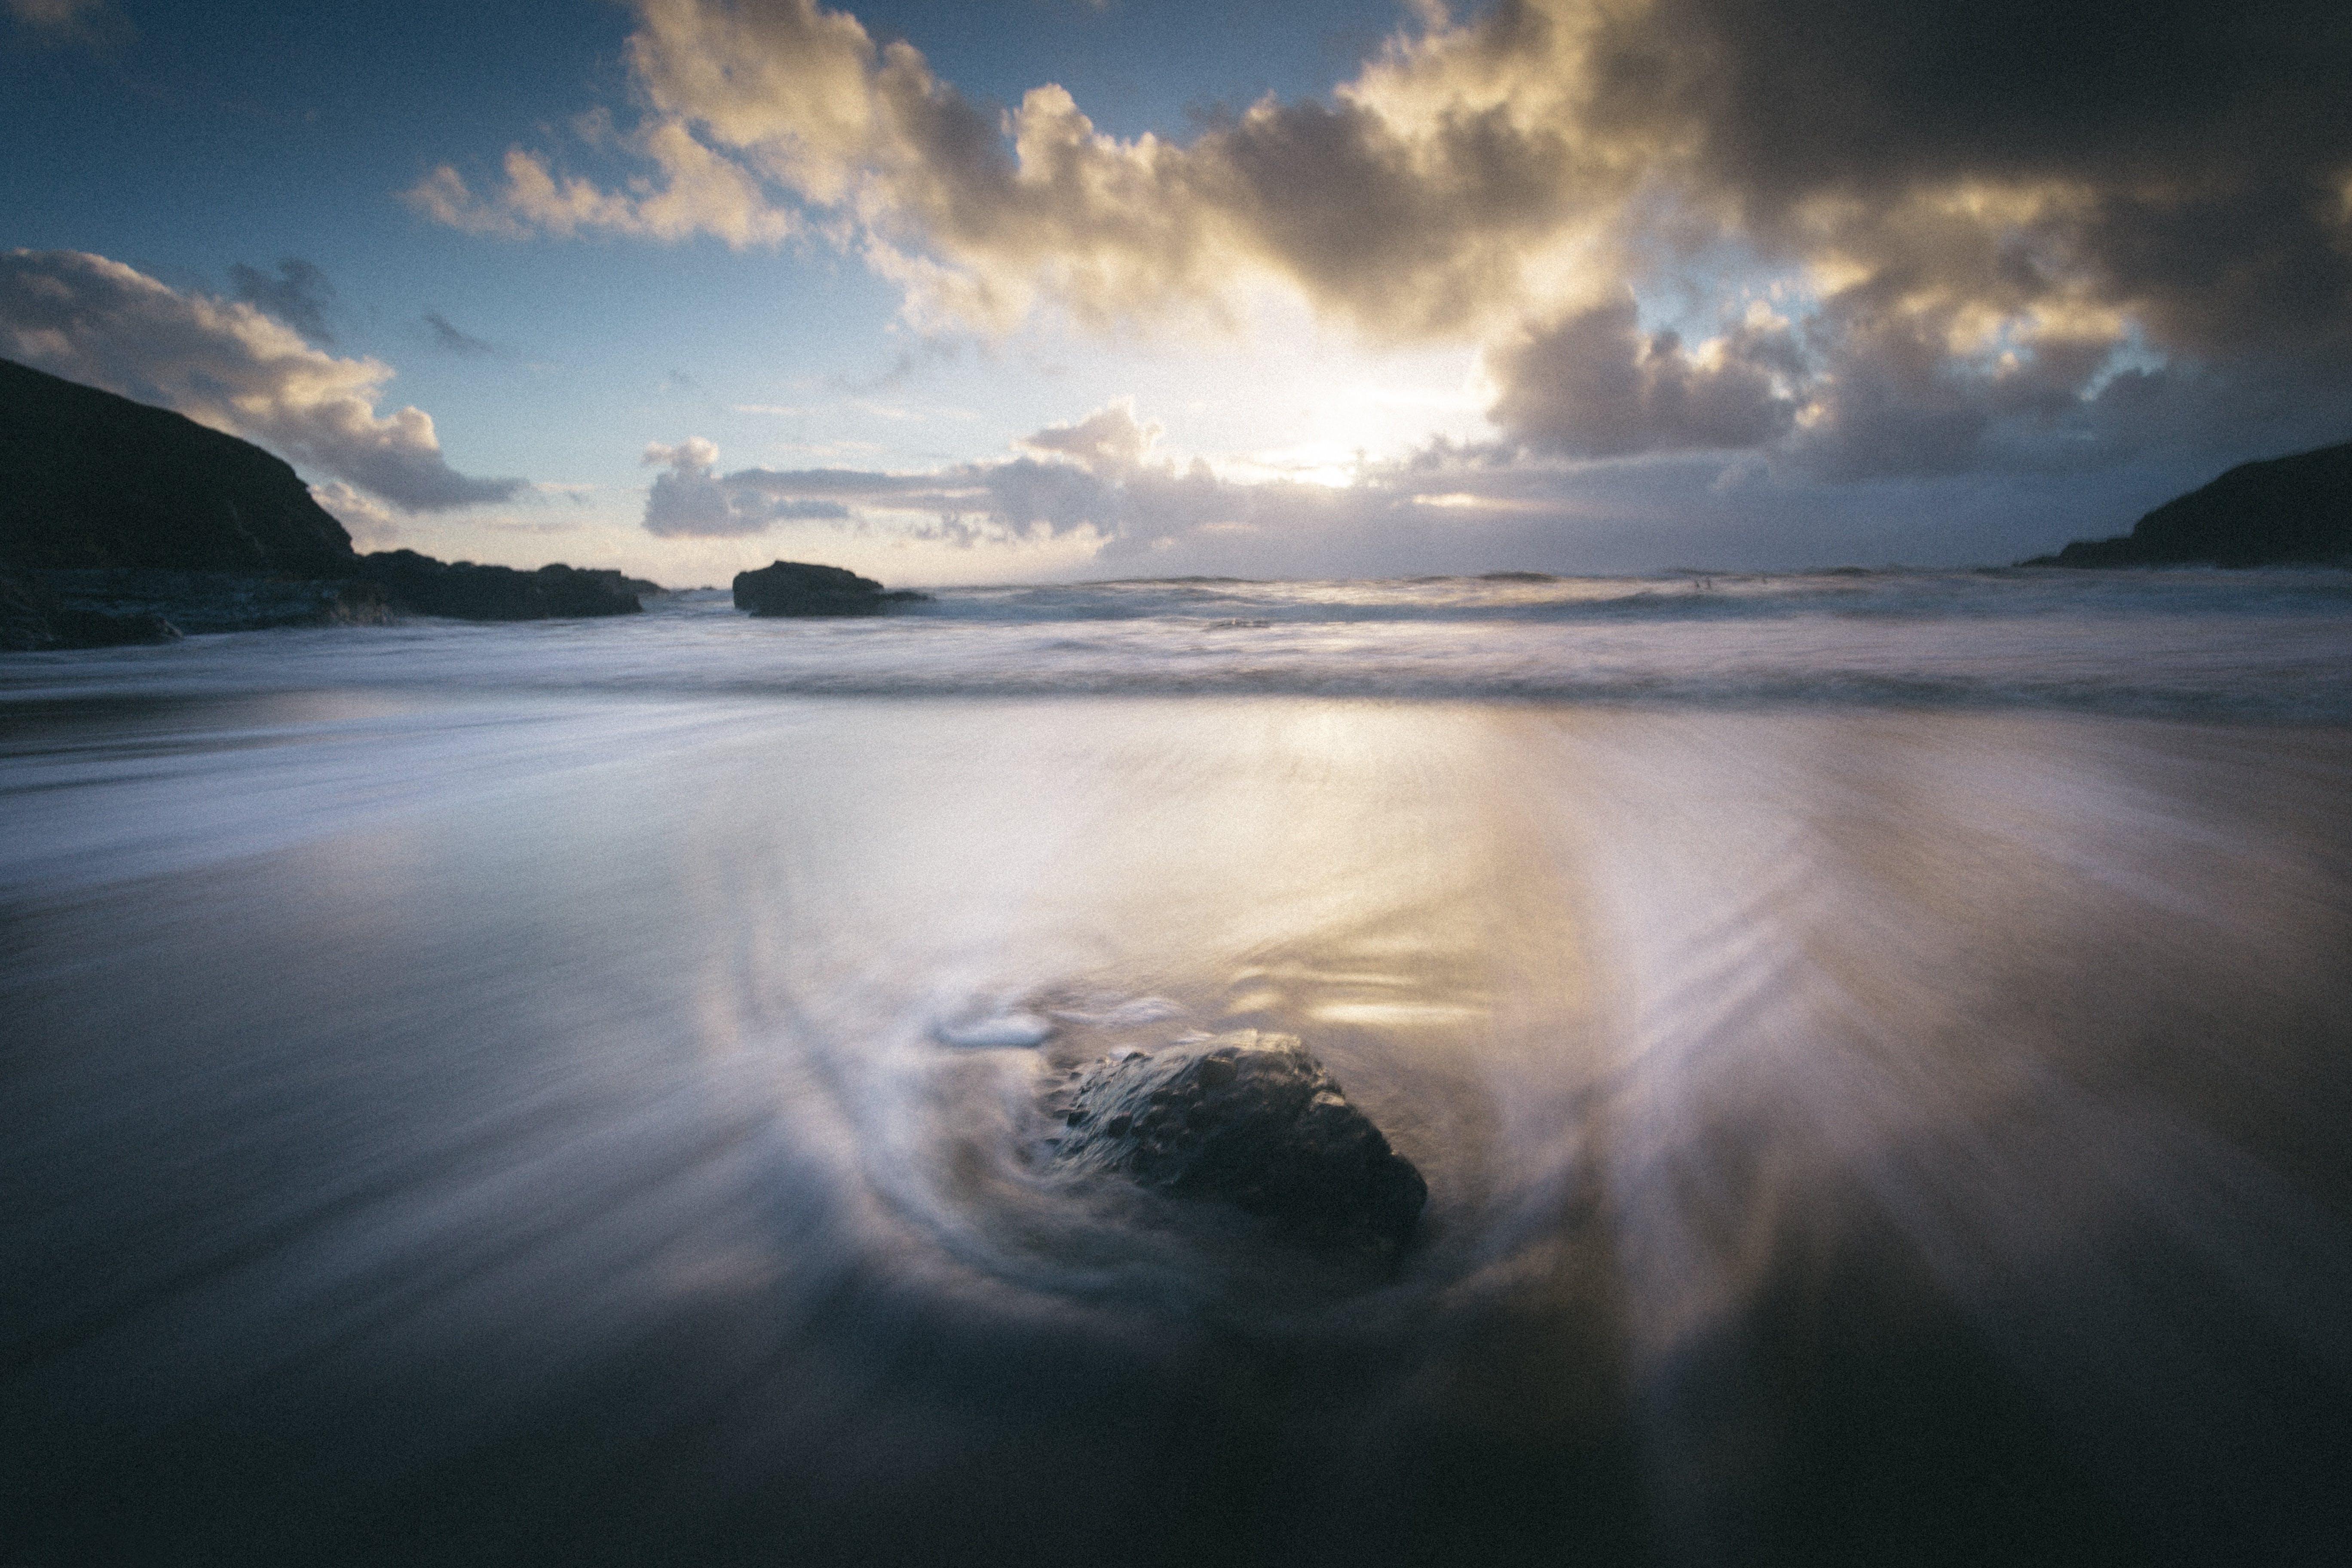 Free stock photo of landscape, sky, beach, water